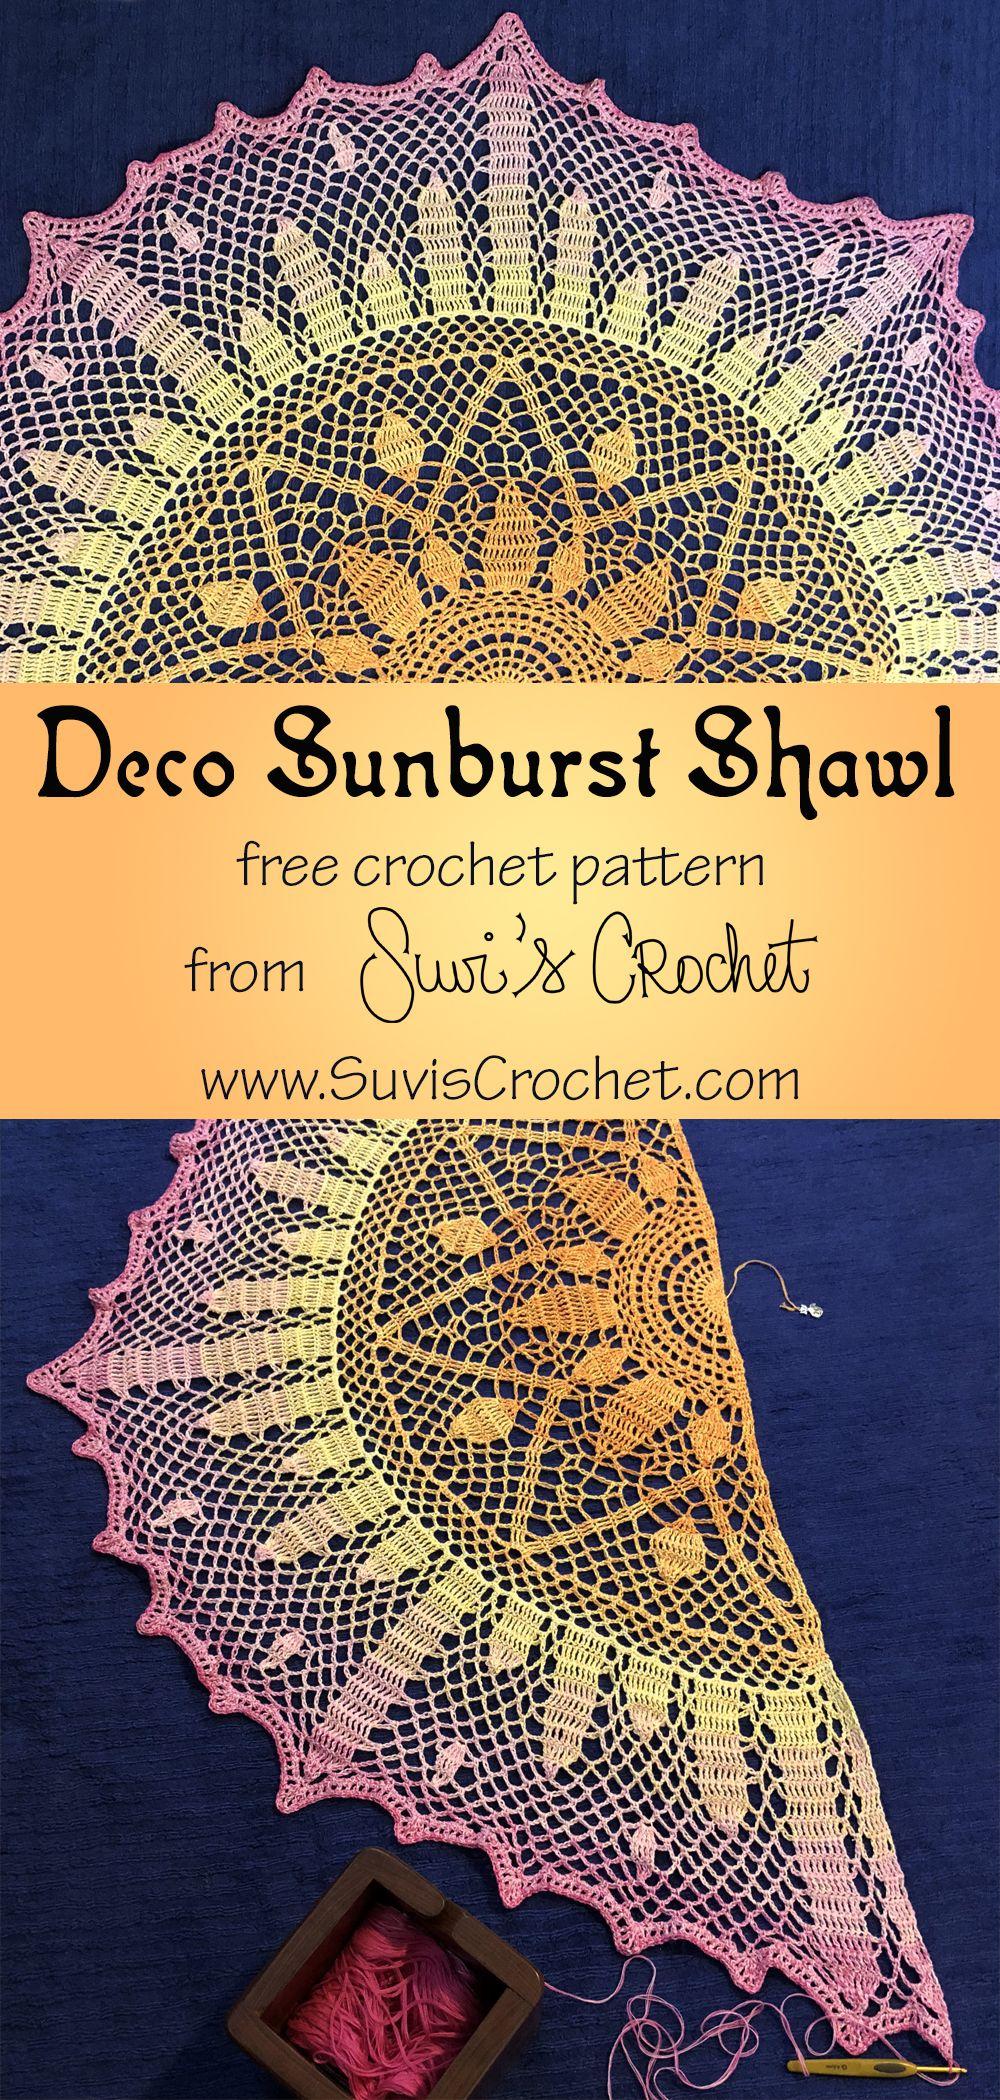 Deco Sunburst Shawl